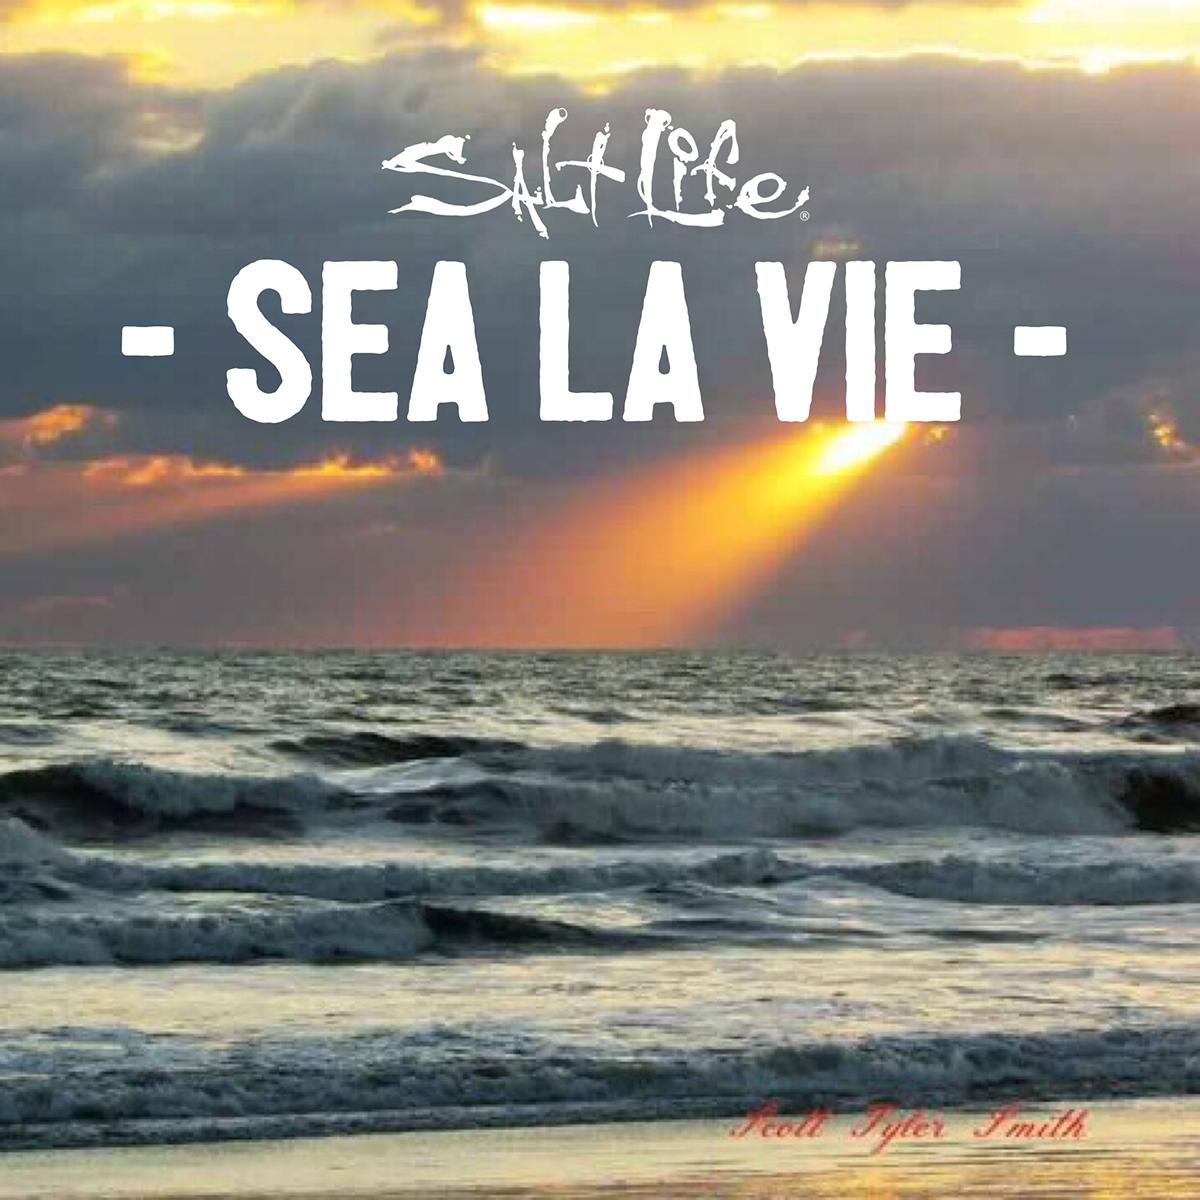 Sea Travel Quotes: Sunset Quotes, Beach Quotes